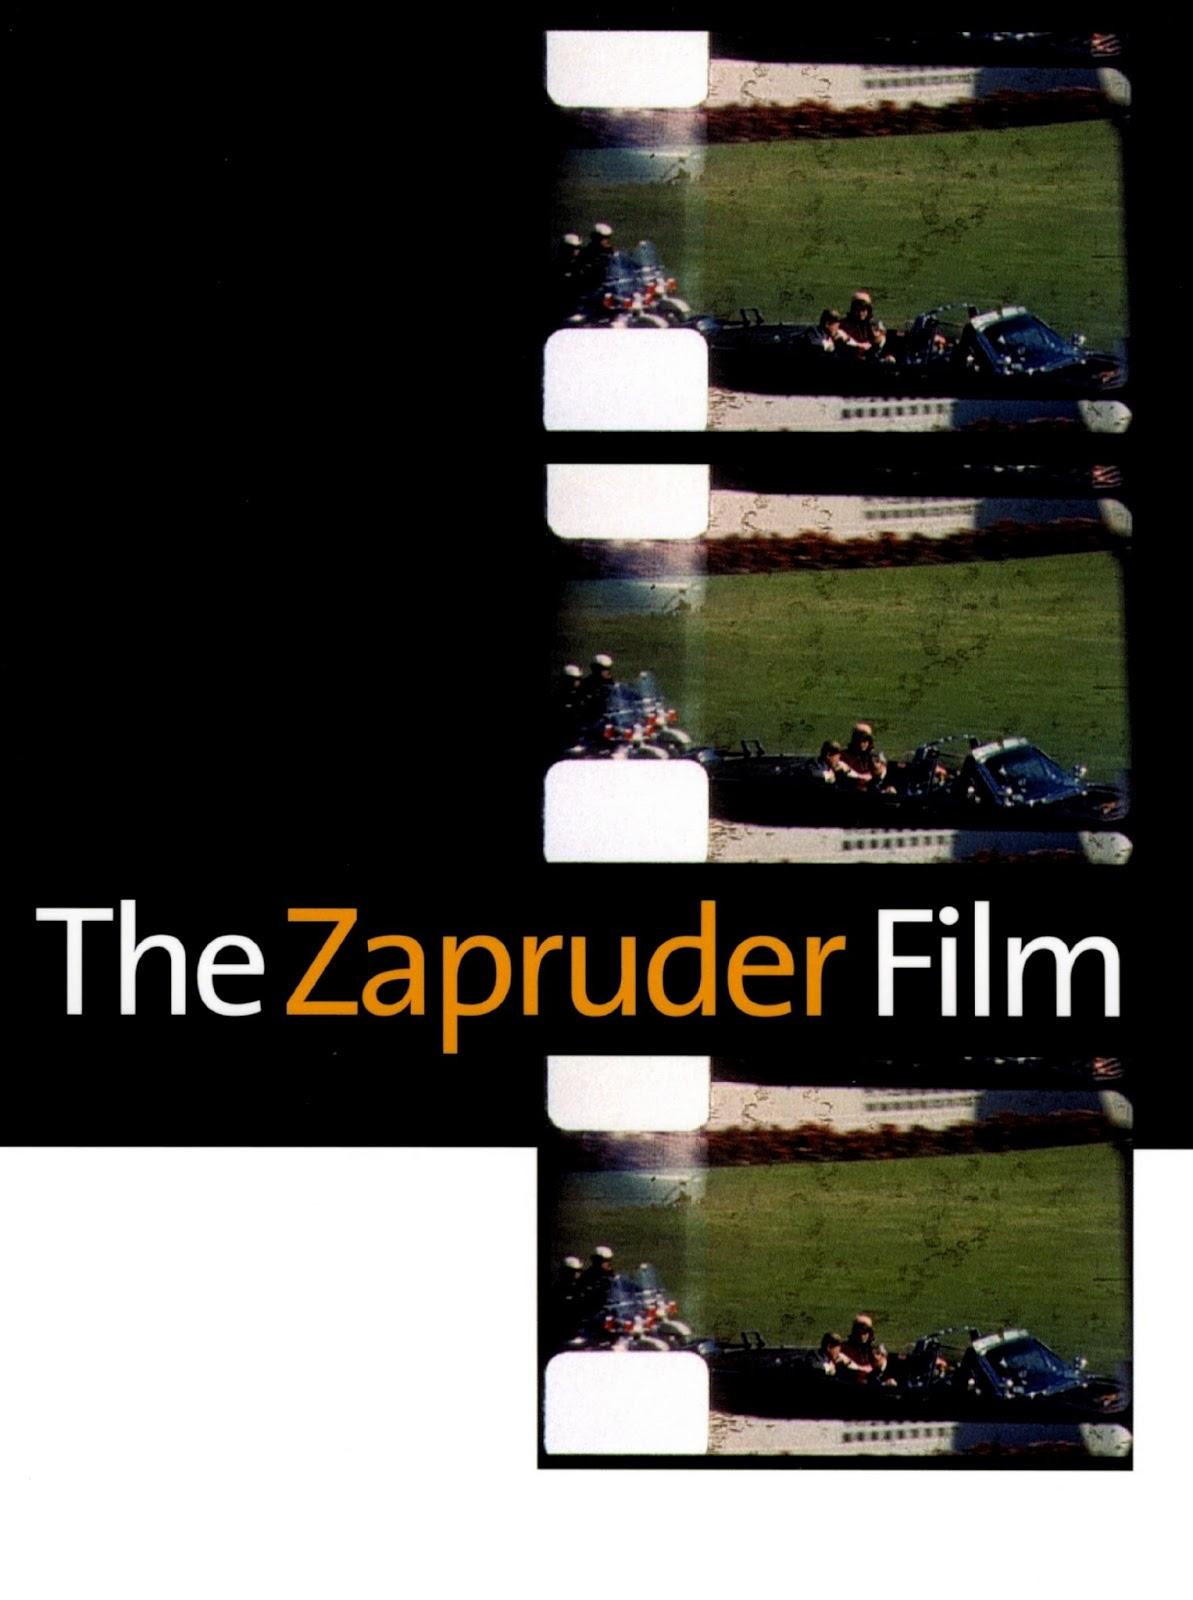 Lecturas Cinematográficas: The Zapruder Film